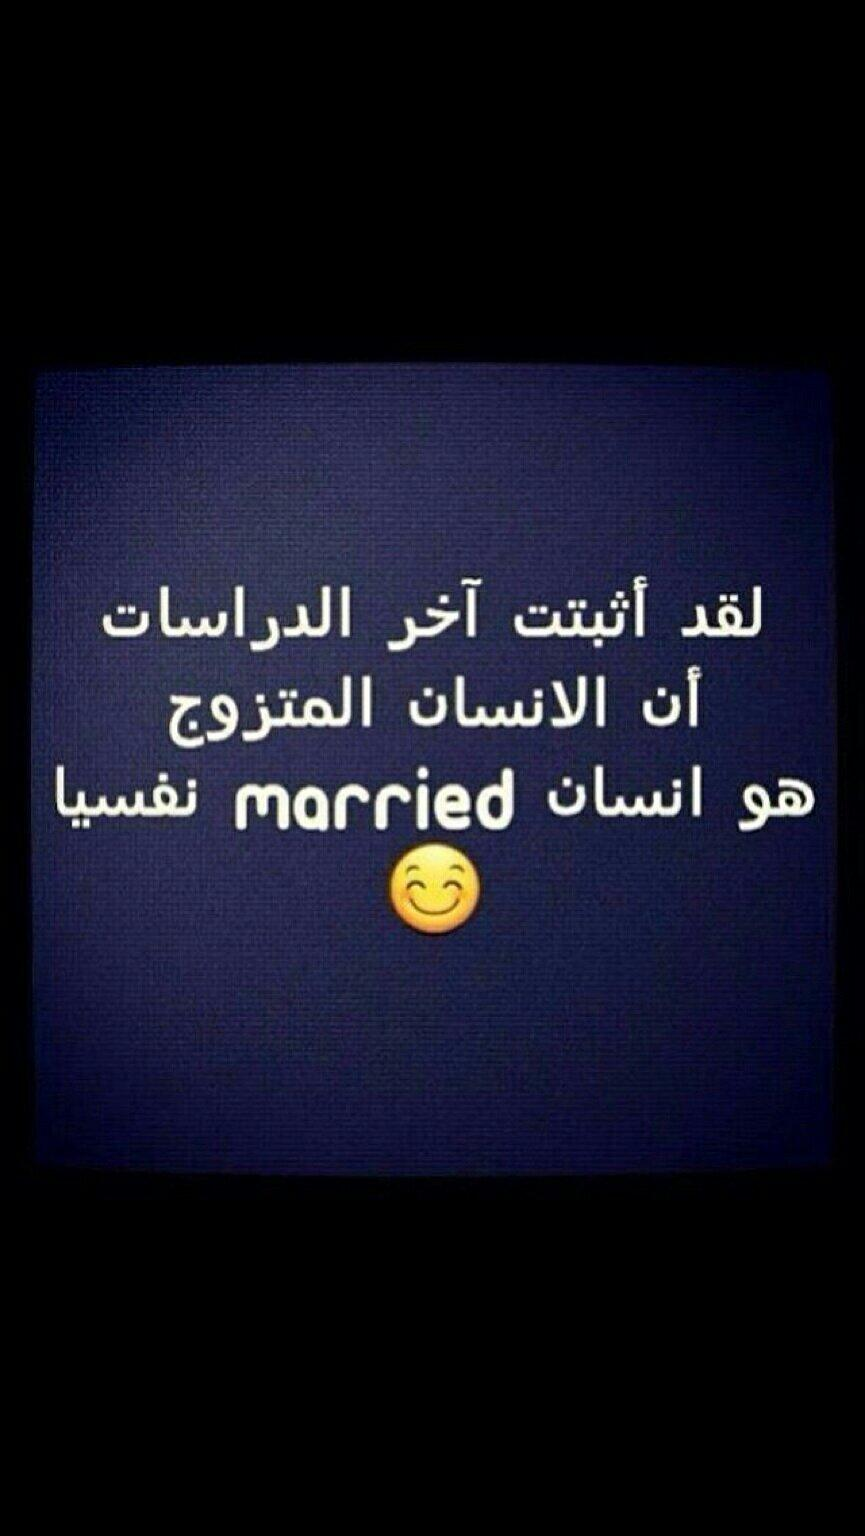 RT @walidfreiha: لقد أثبتت آخر الدراسات ان الانسان المتزوج هو انسان married نفسيا 😂😂😂😂😂 http://t.co/oQzSLBEKFB